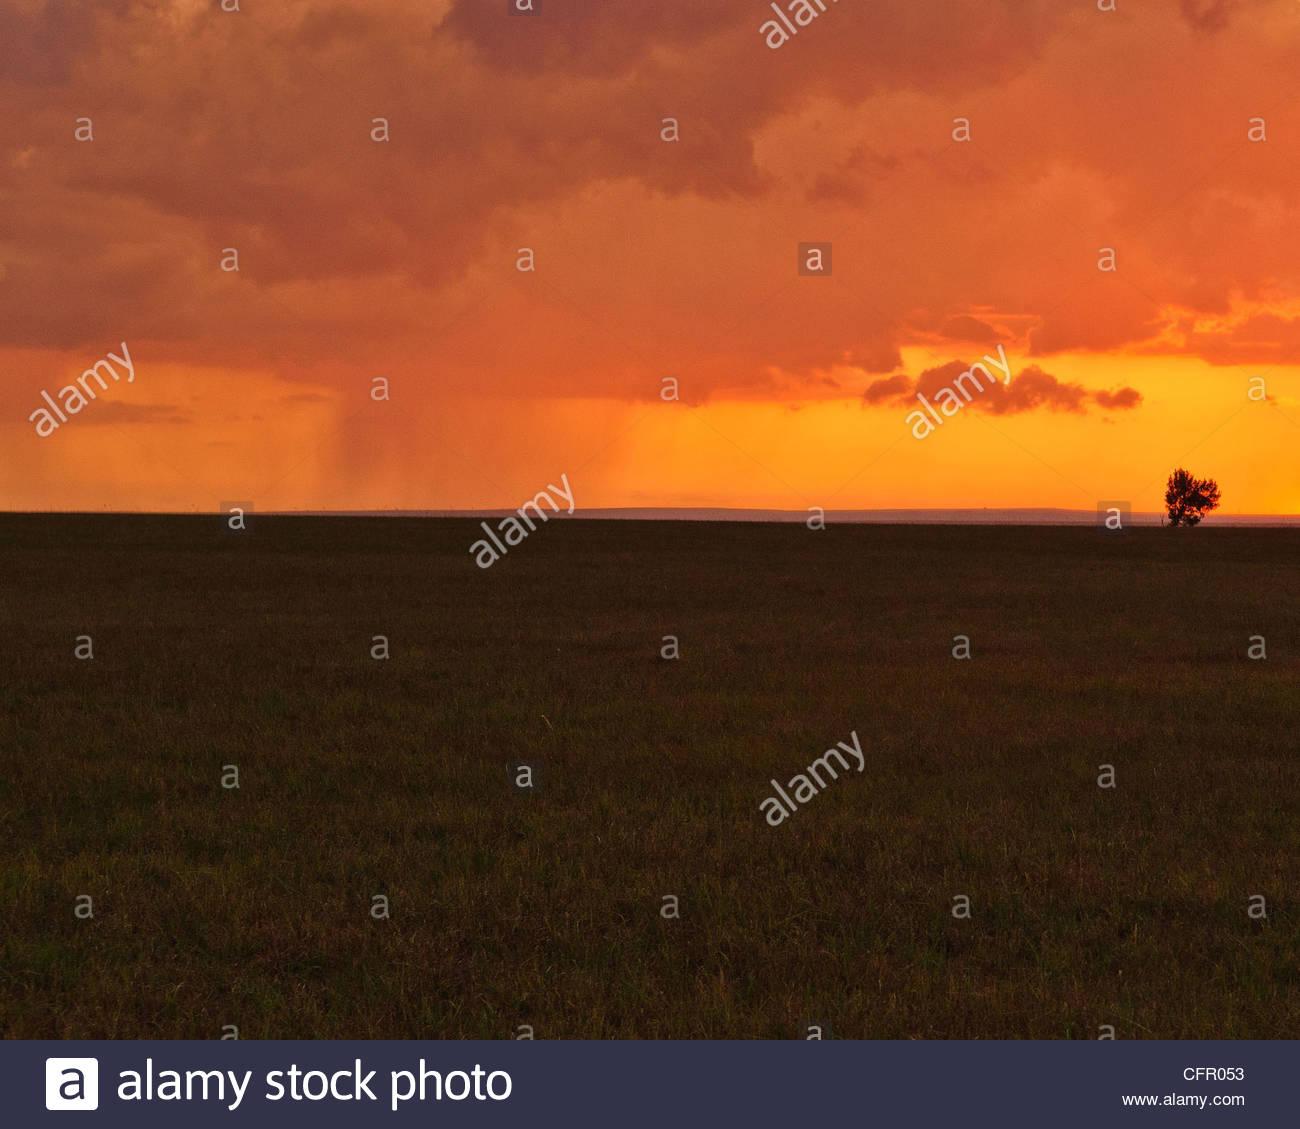 Storm Clouds over Field at Sunset, Flint Hills, Hamilton, KS., Sept. 10, 2011 - Stock Image